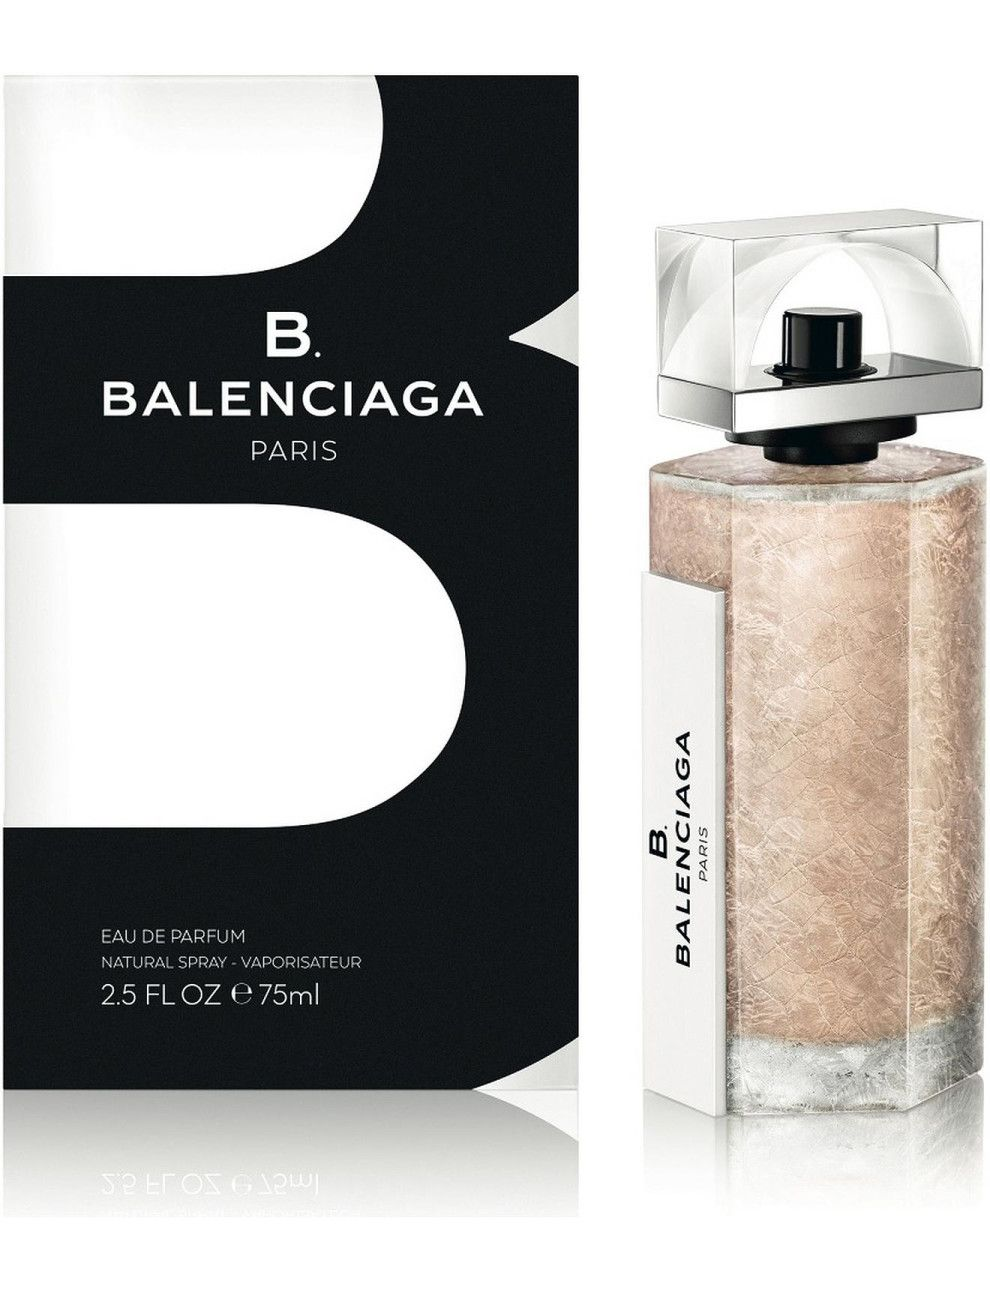 B. Balenciaga Eau de Parfum 75ml David Jones